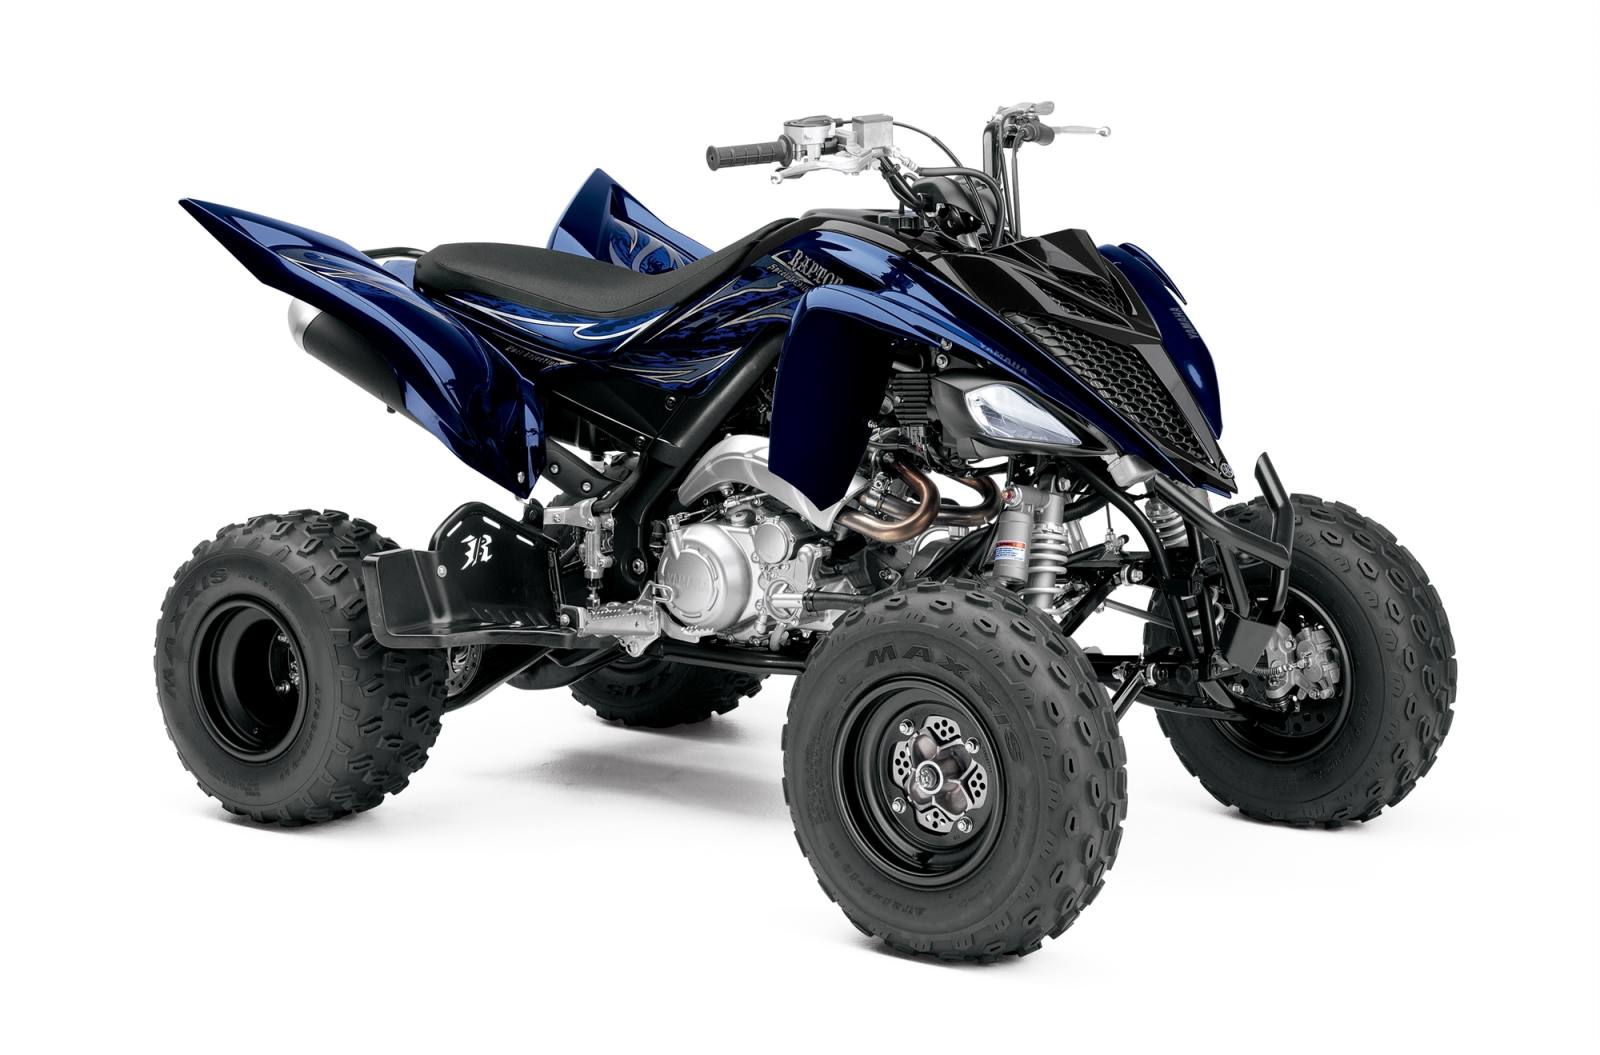 2014 Yamaha Raptor 700R SE for sale in Fairbanks, AK. Northern Power ...